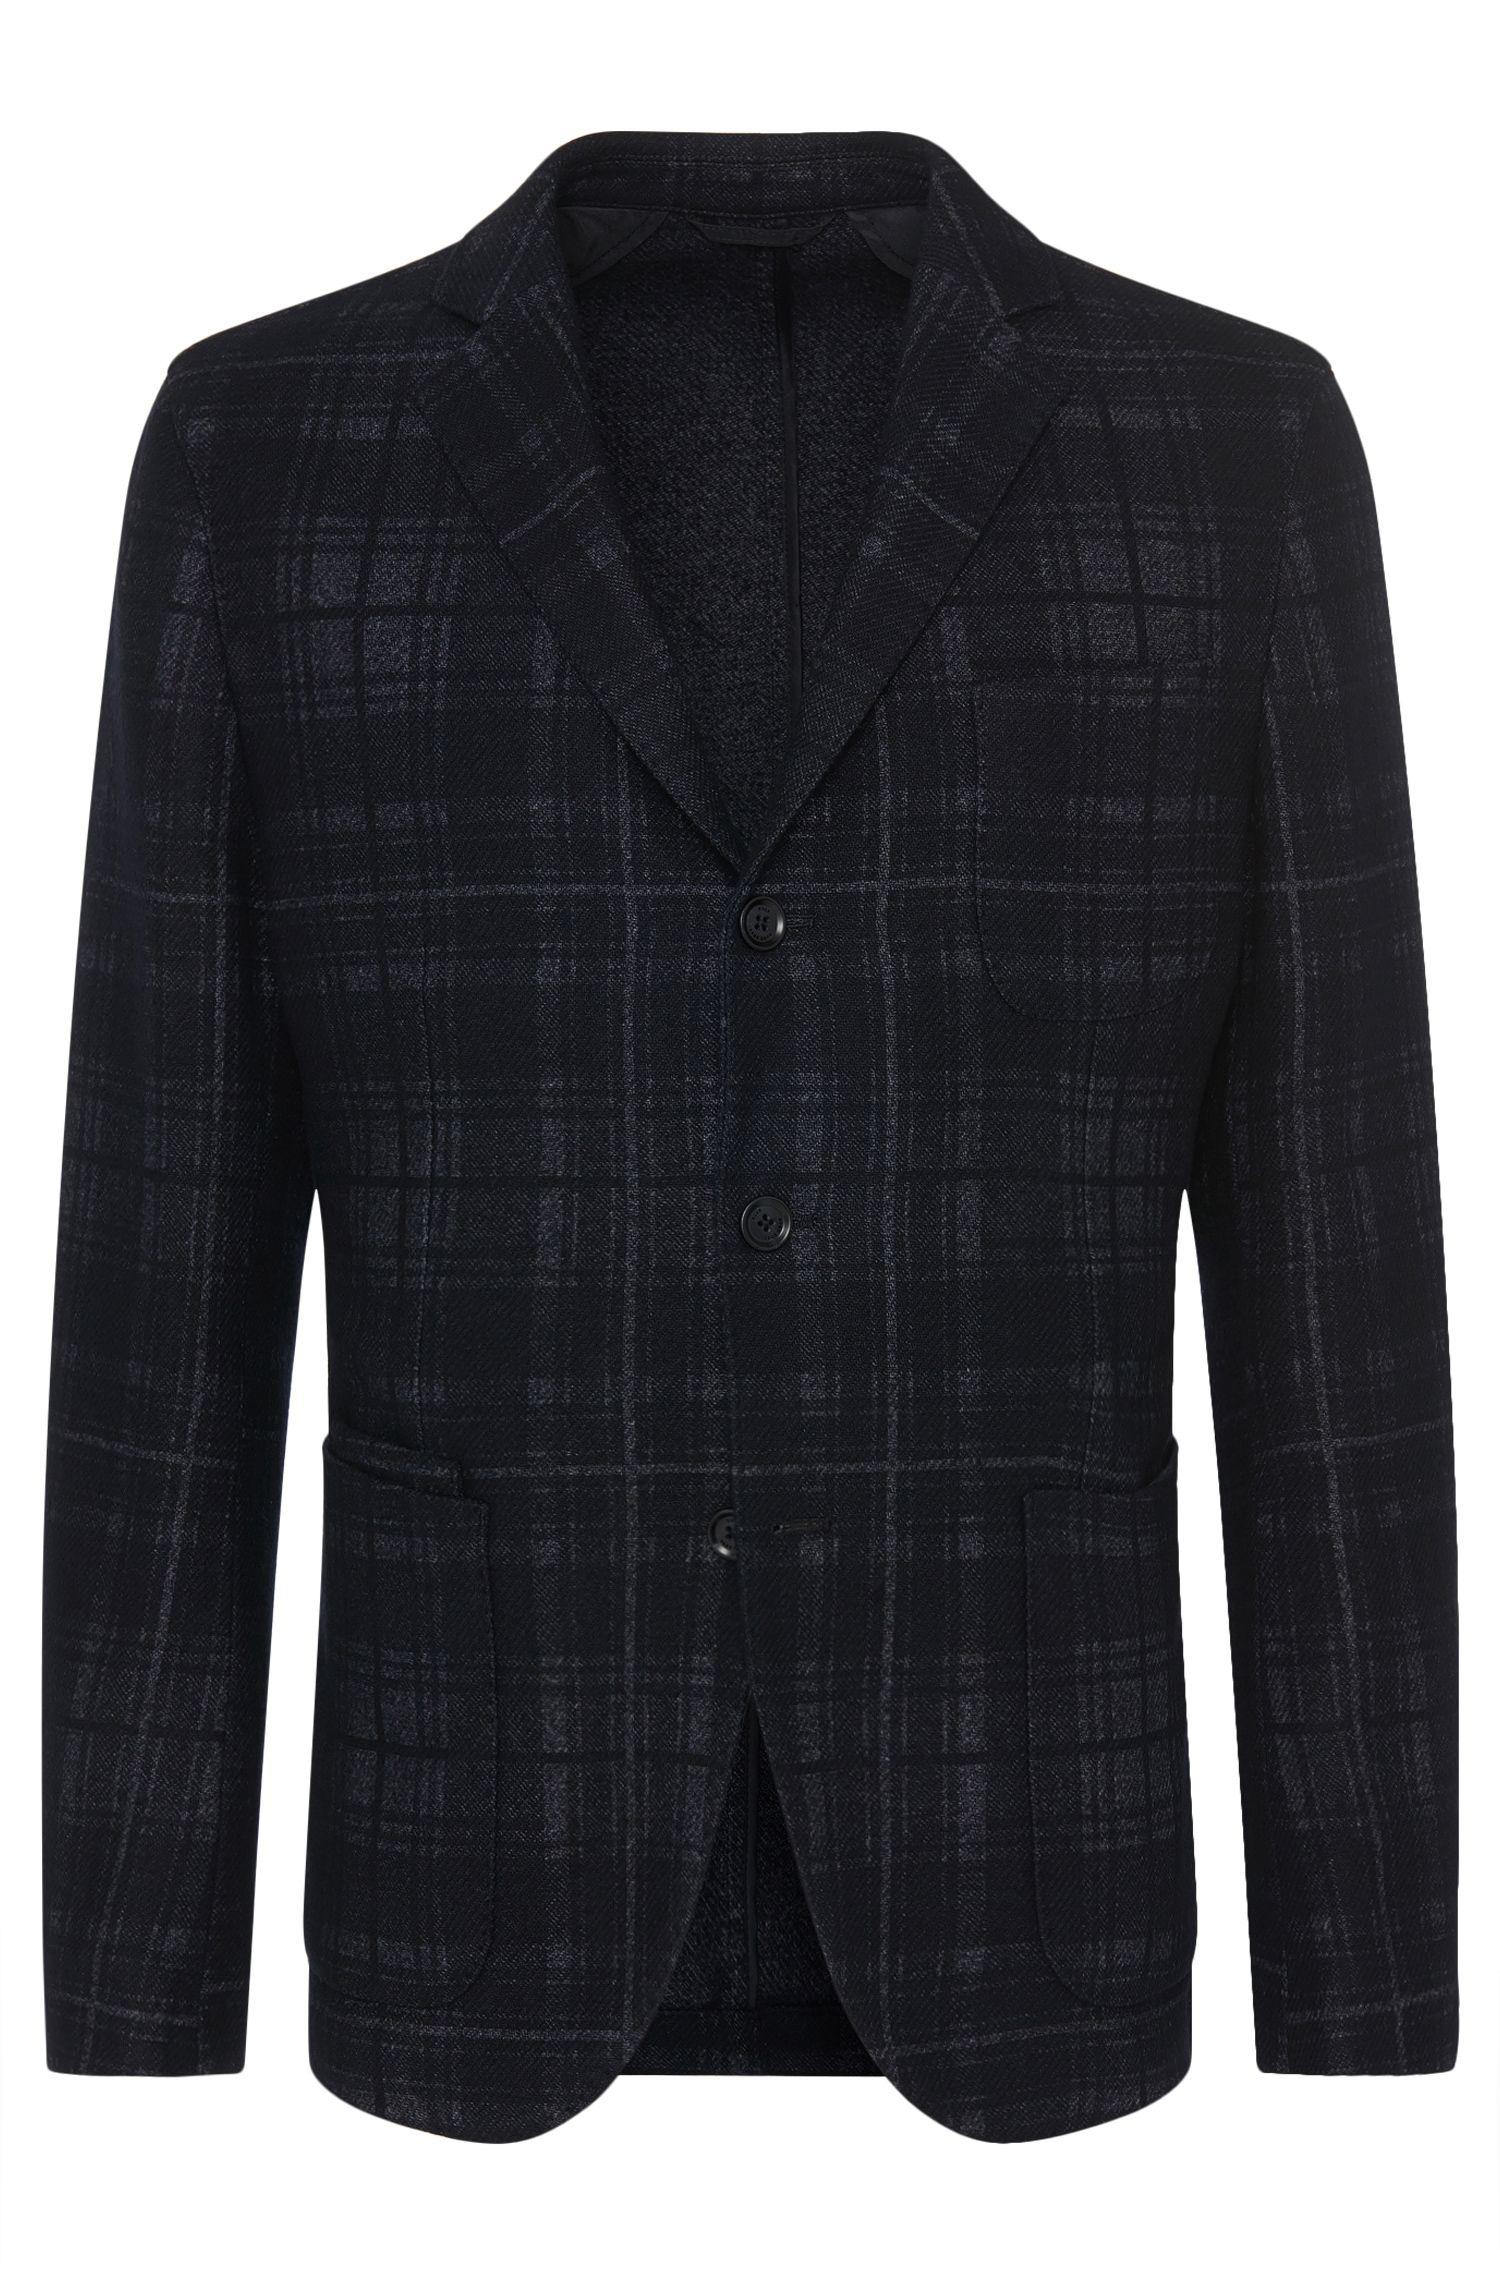 'Nolius-D' | Slim Fit, Virgin Wool Blend Plaid Sport Coat